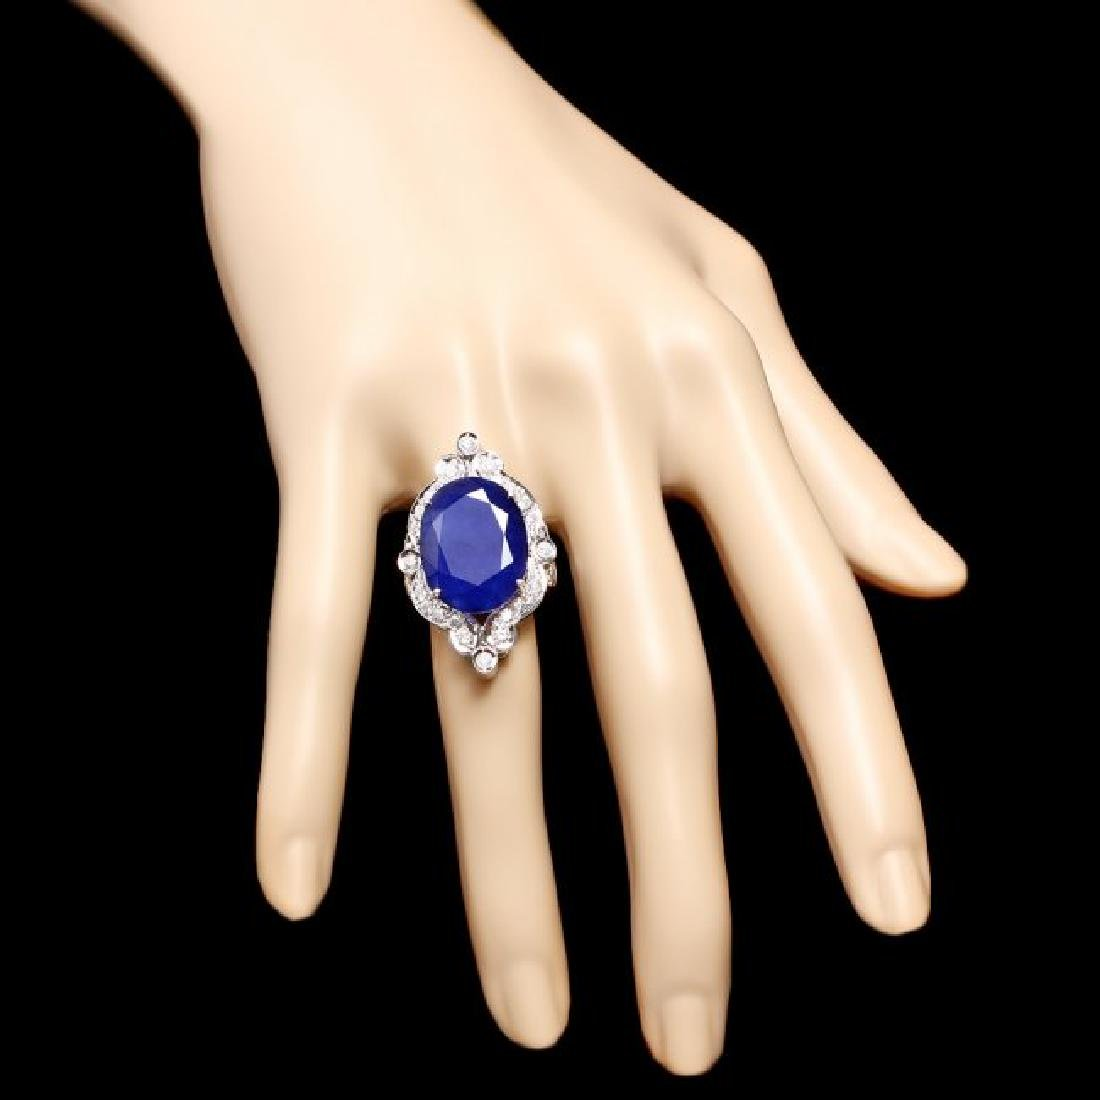 14k Gold 19.15ct Sapphire 1.30ct Diamond Ring - 4